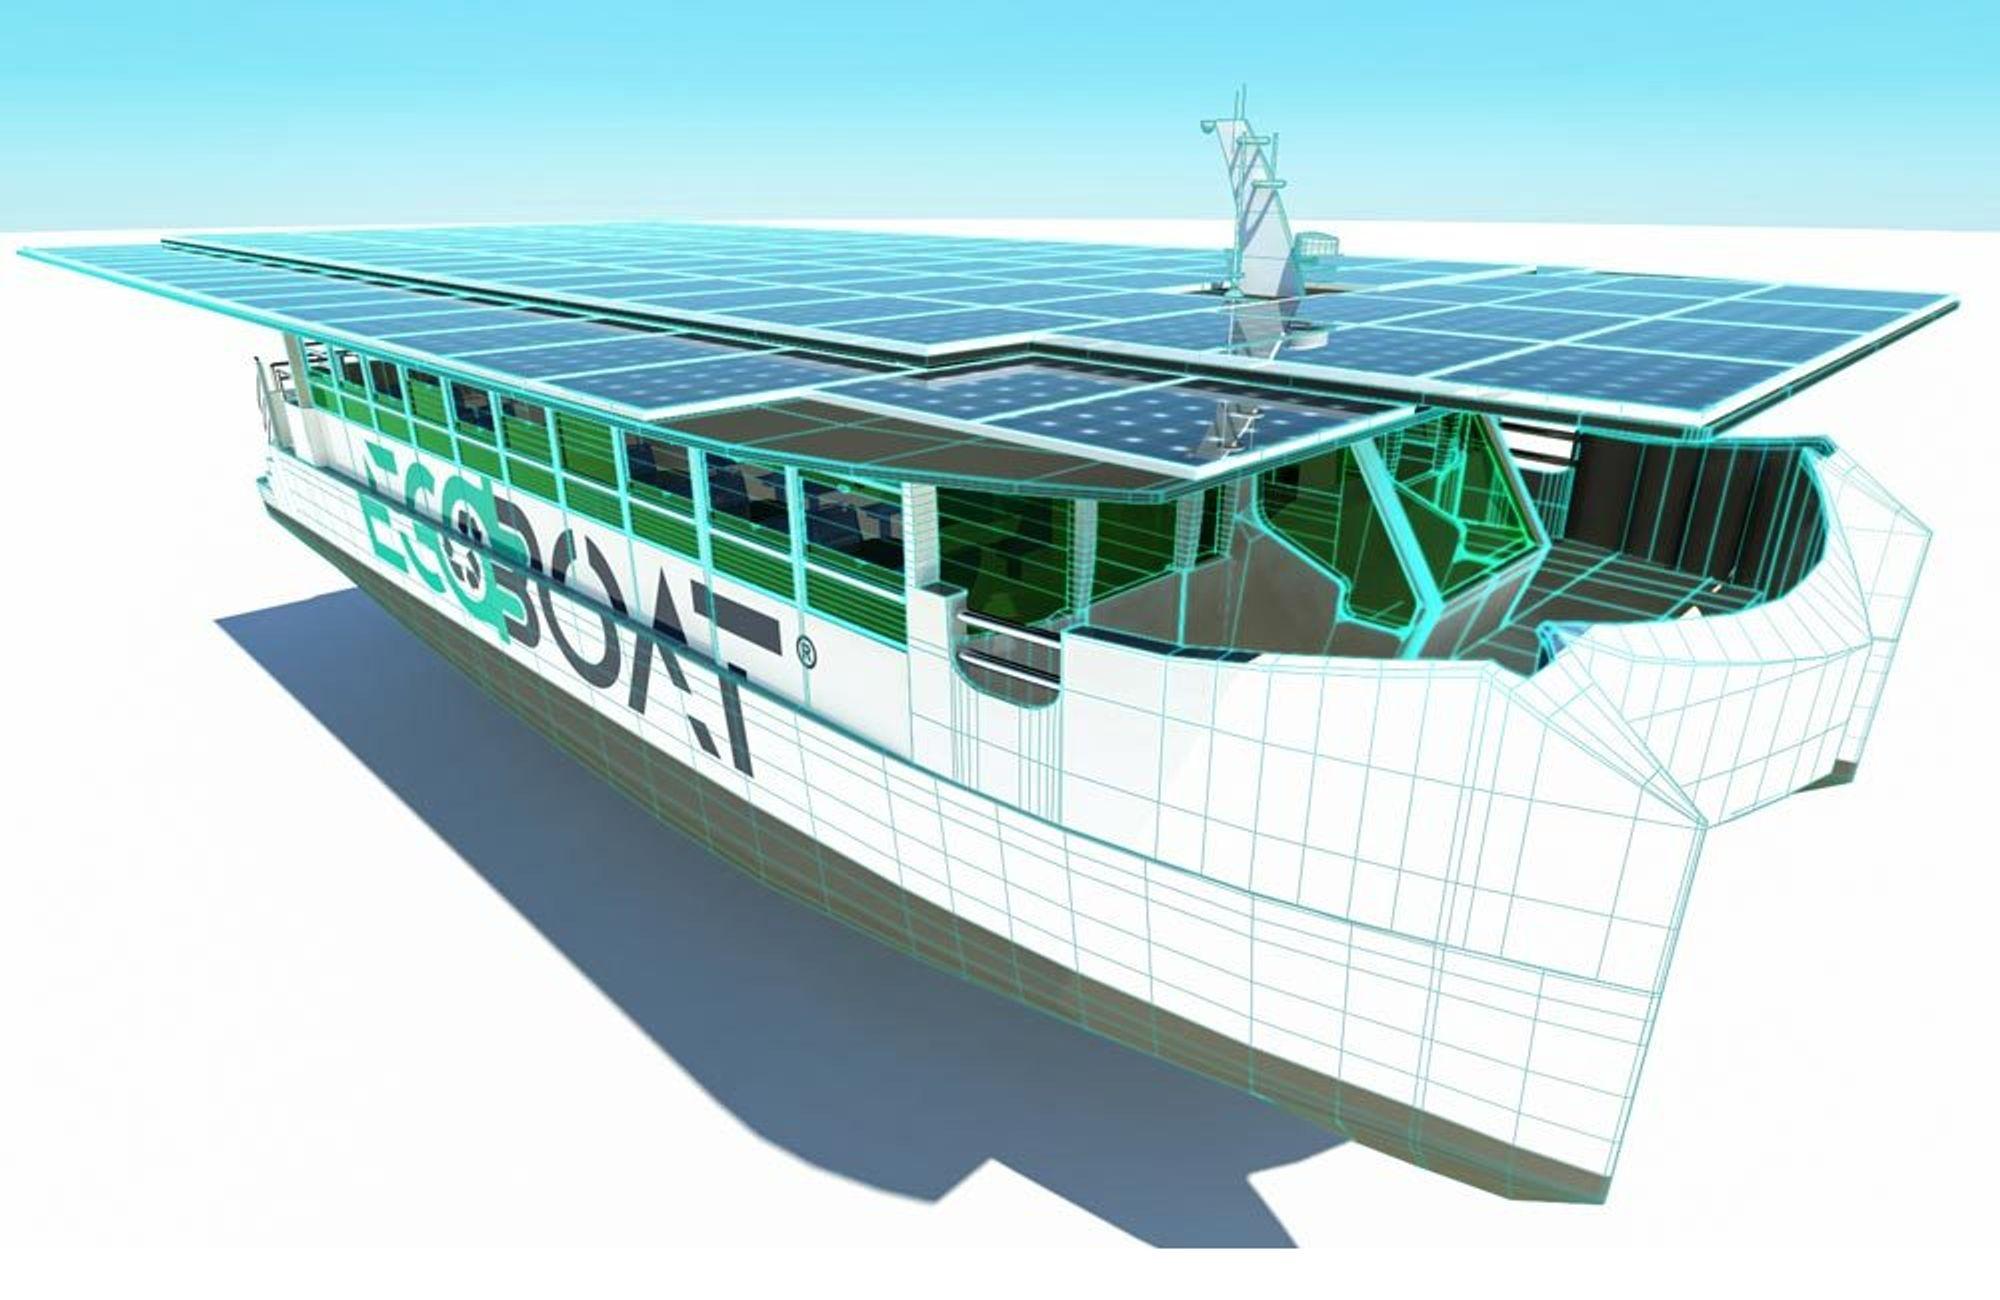 Ecocat har 120 solpaneler på taket. Et pneumatisk system sørger for at arealet utvides ved at paneler skyves ut på begge sider.